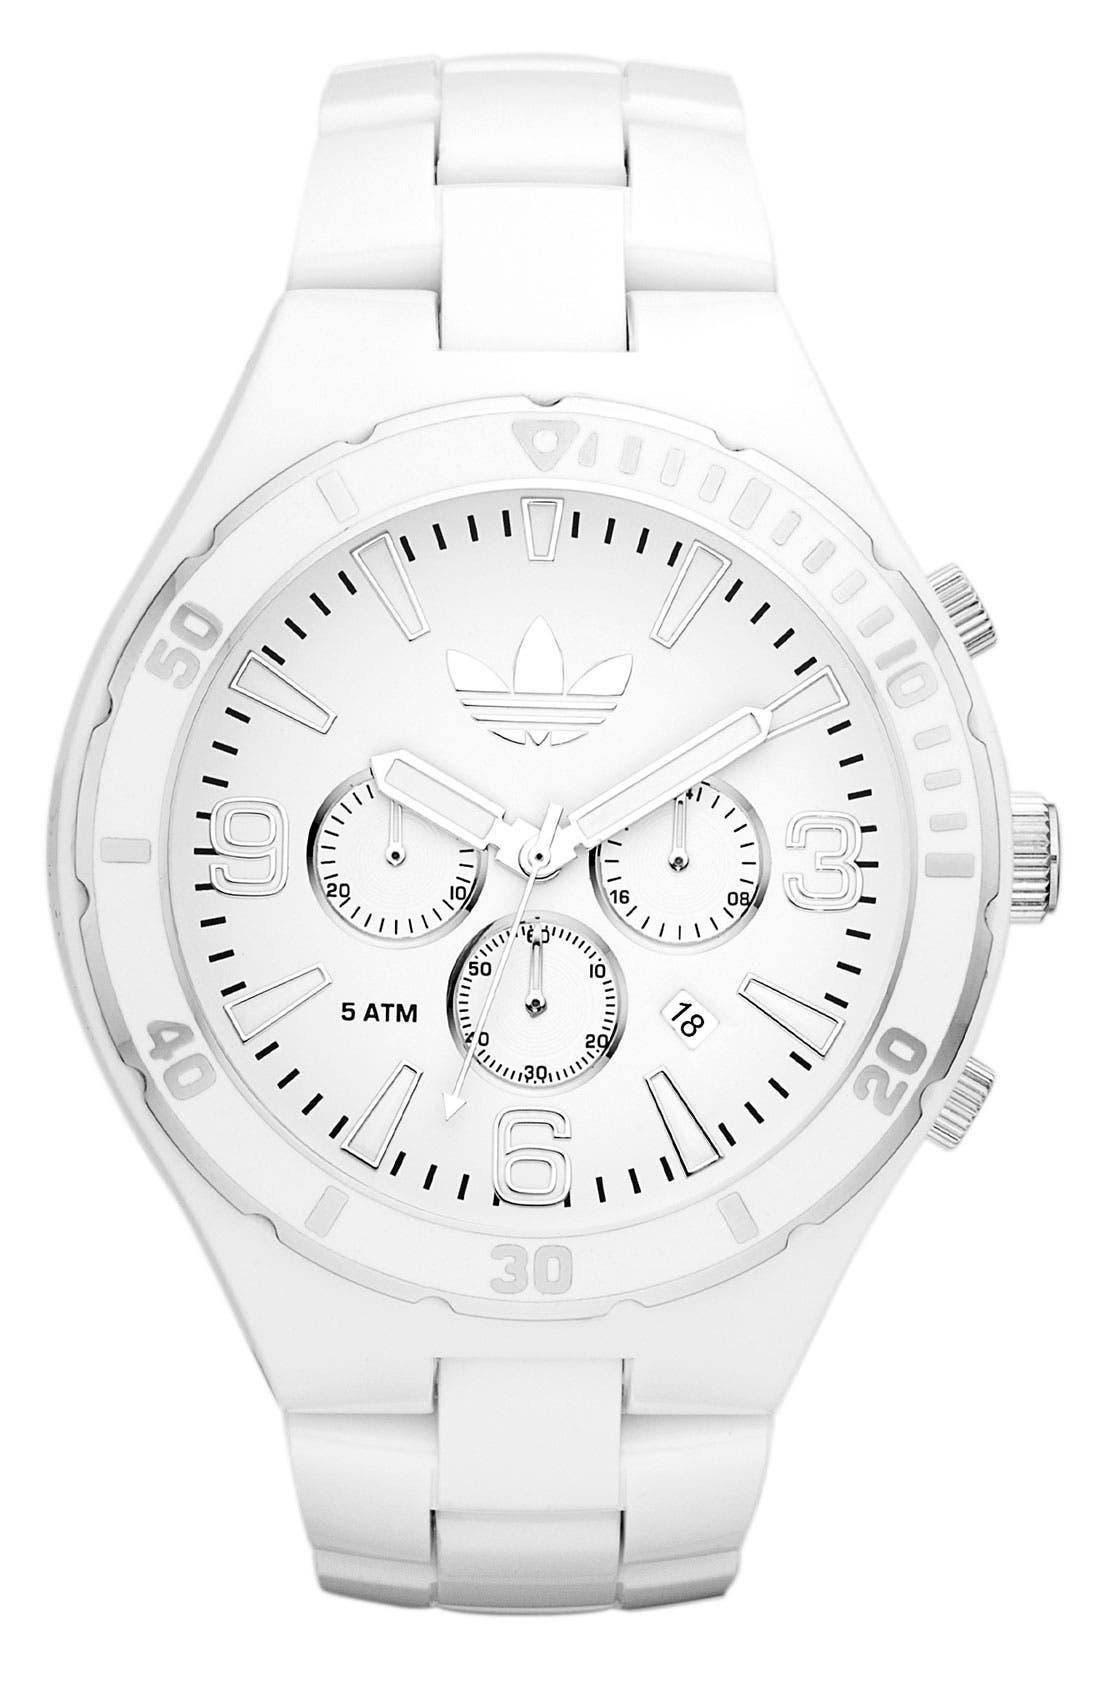 Main Image - adidas Originals 'Melbourne' Large Chronograph Bracelet Watch, 50mm